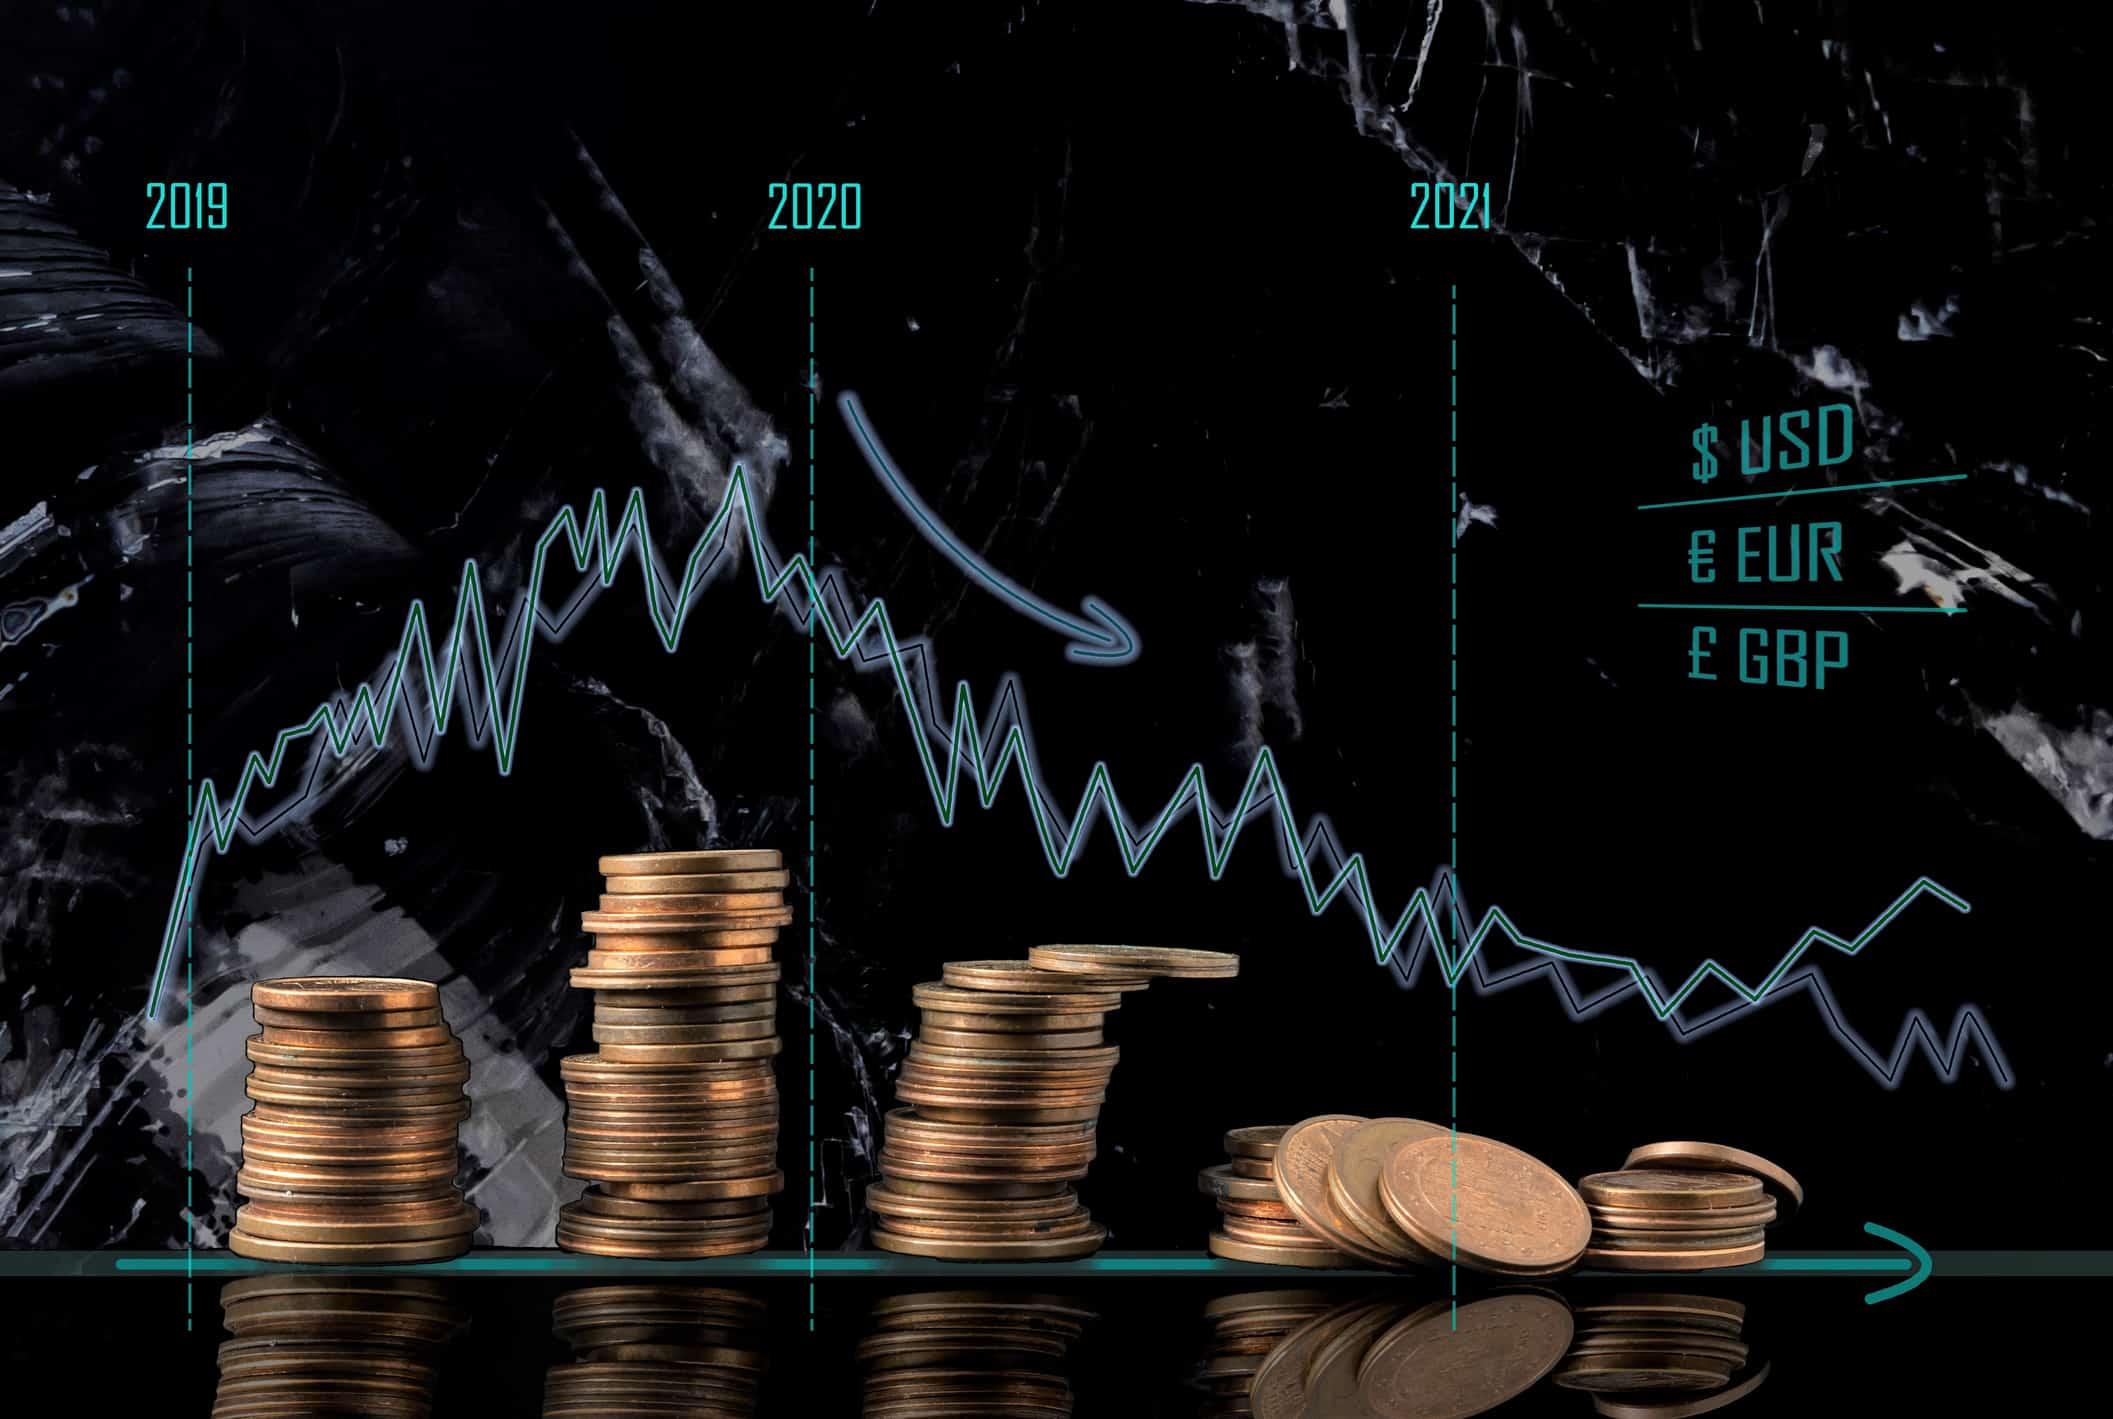 Reduced dividends, falling dividends, falling stock, downward trend